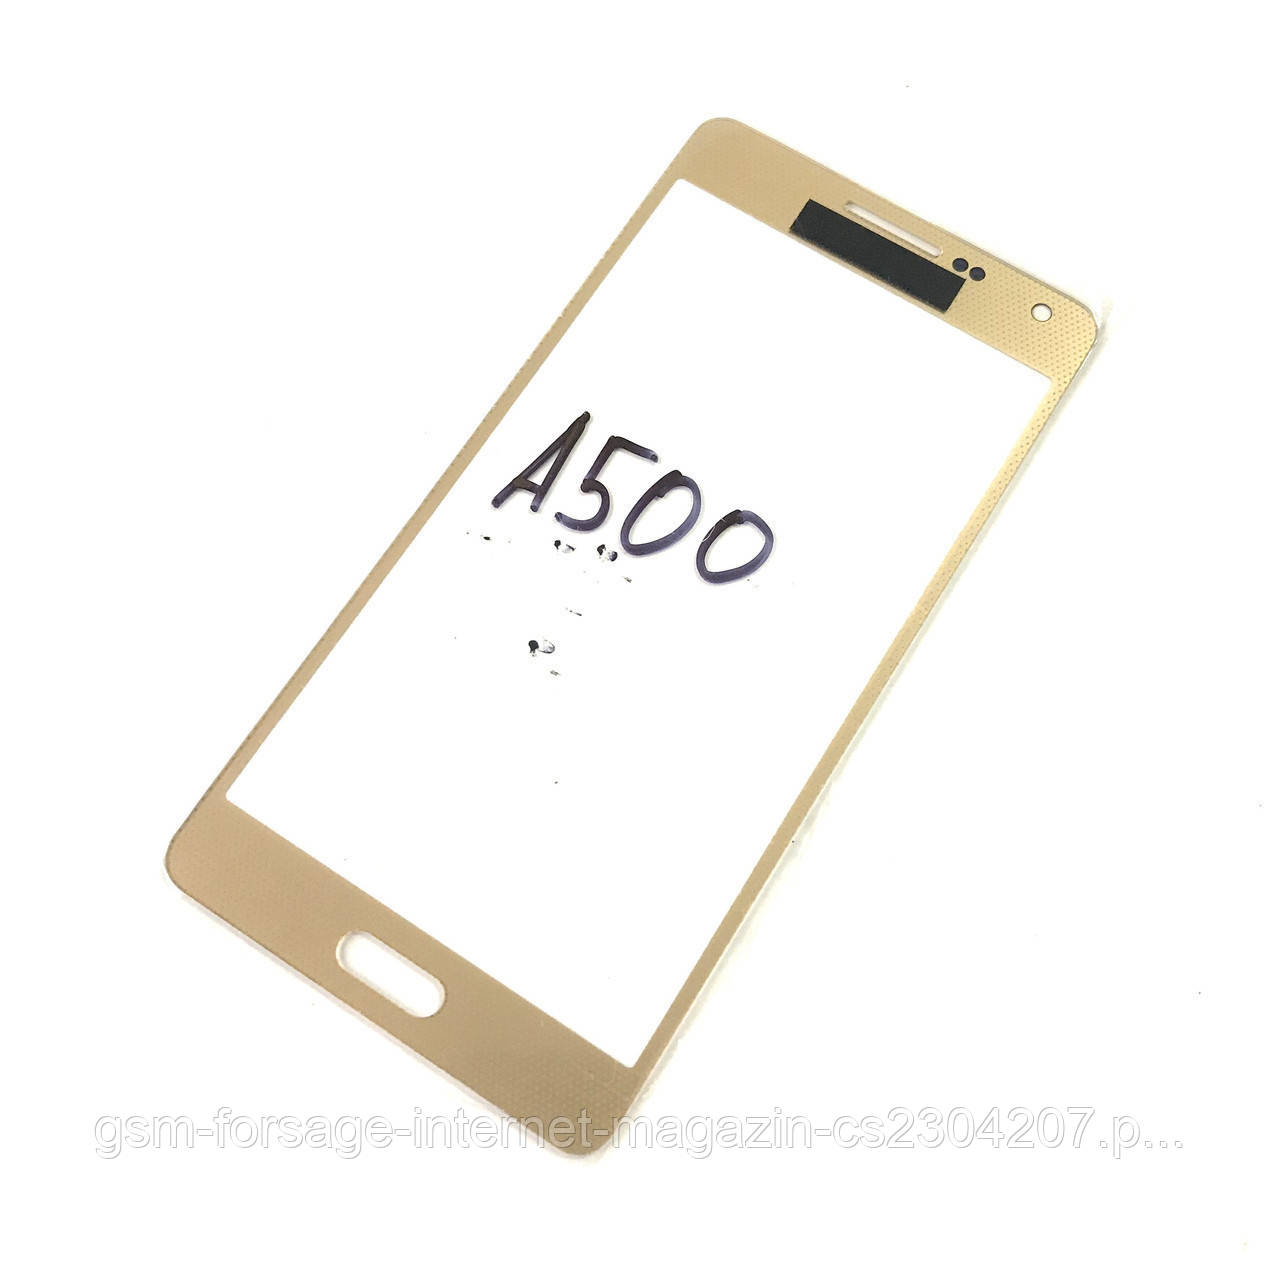 Стекло дисплея Samsung Galaxy A5 SM-A500F Gold (для переклейки)